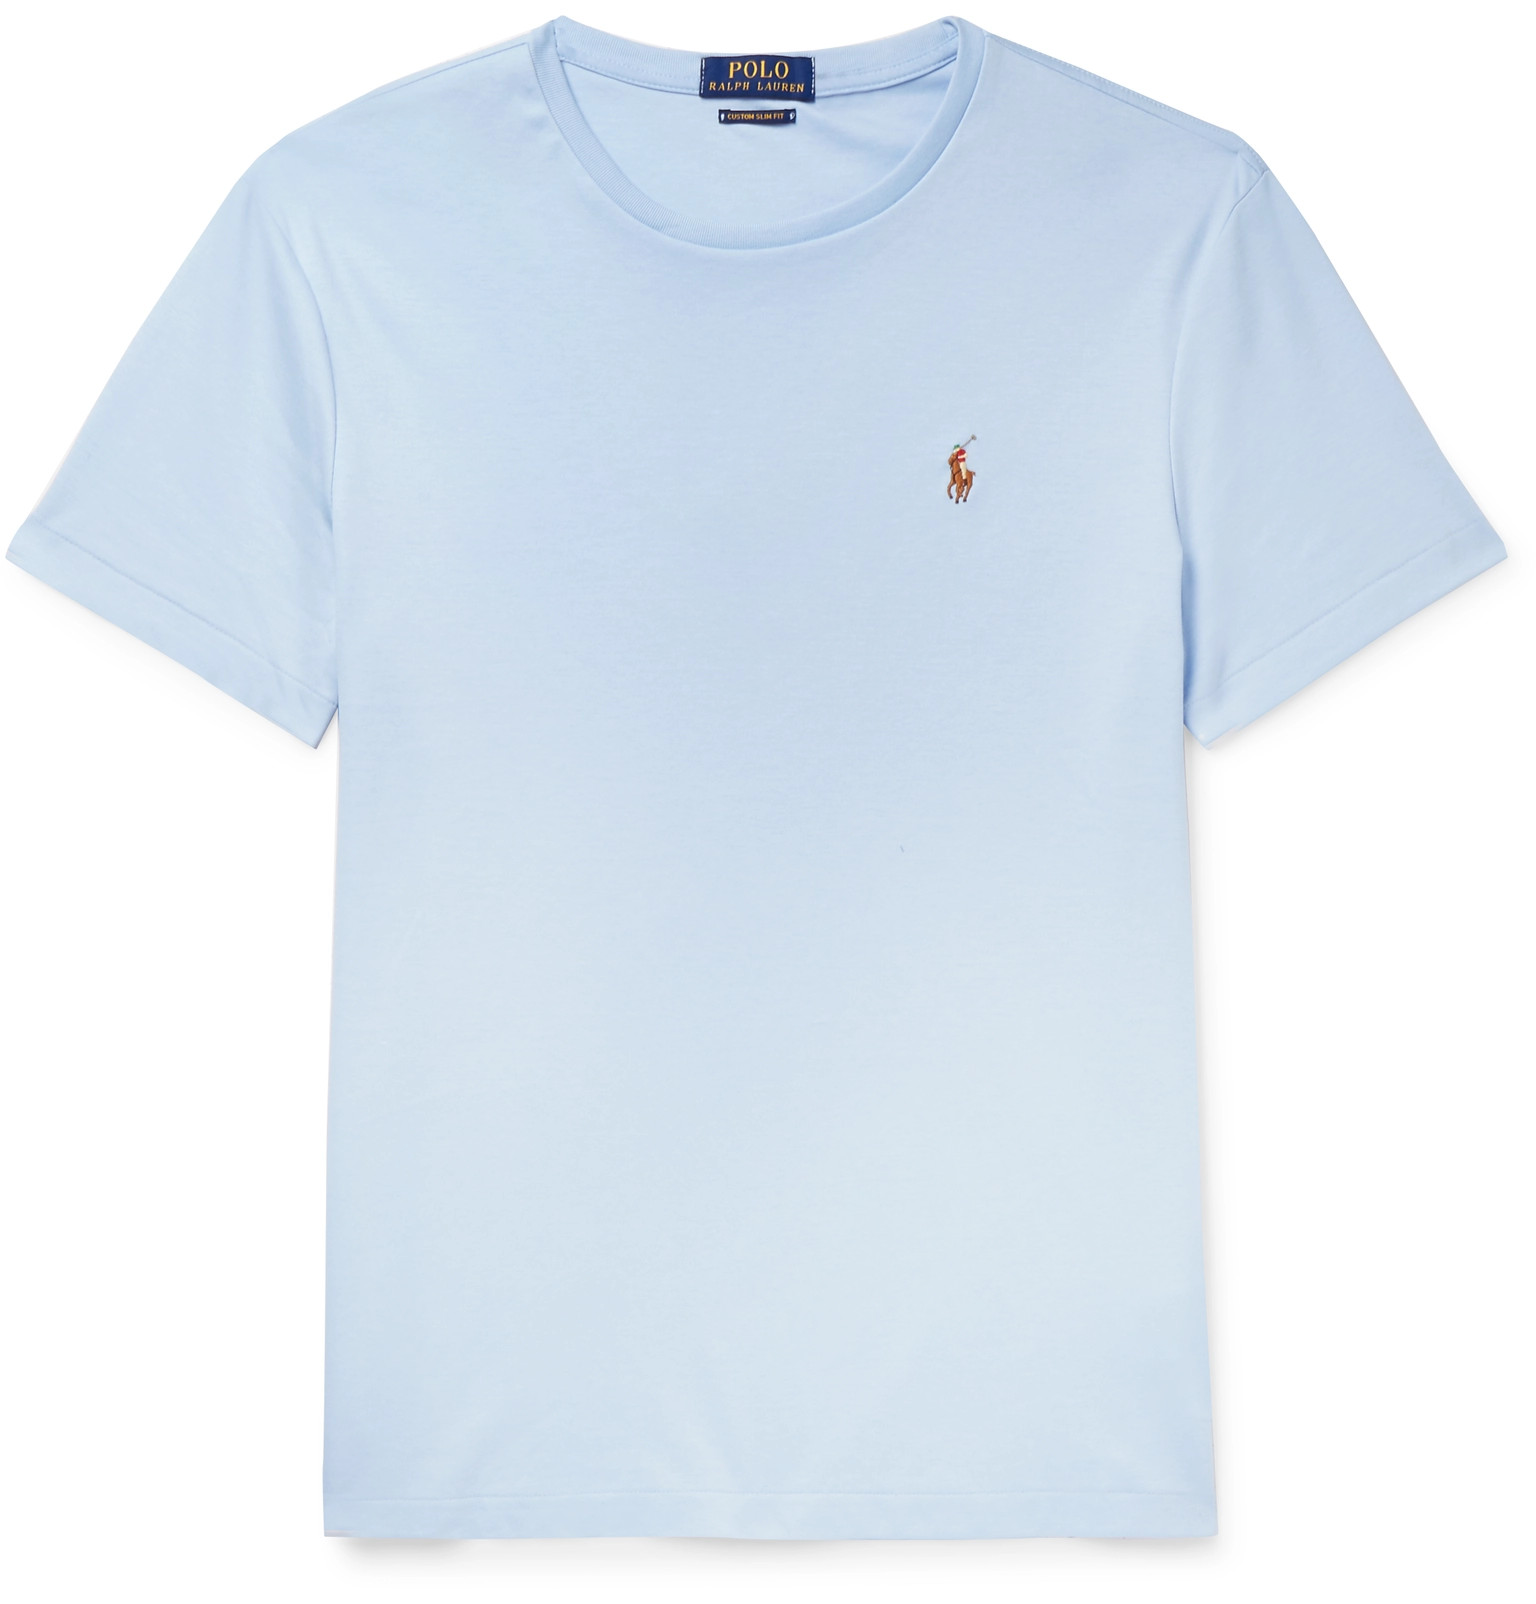 Polo Ralph Lauren - Slim-Fit Cotton-Jersey T-Shirt 3645aeb2ad4